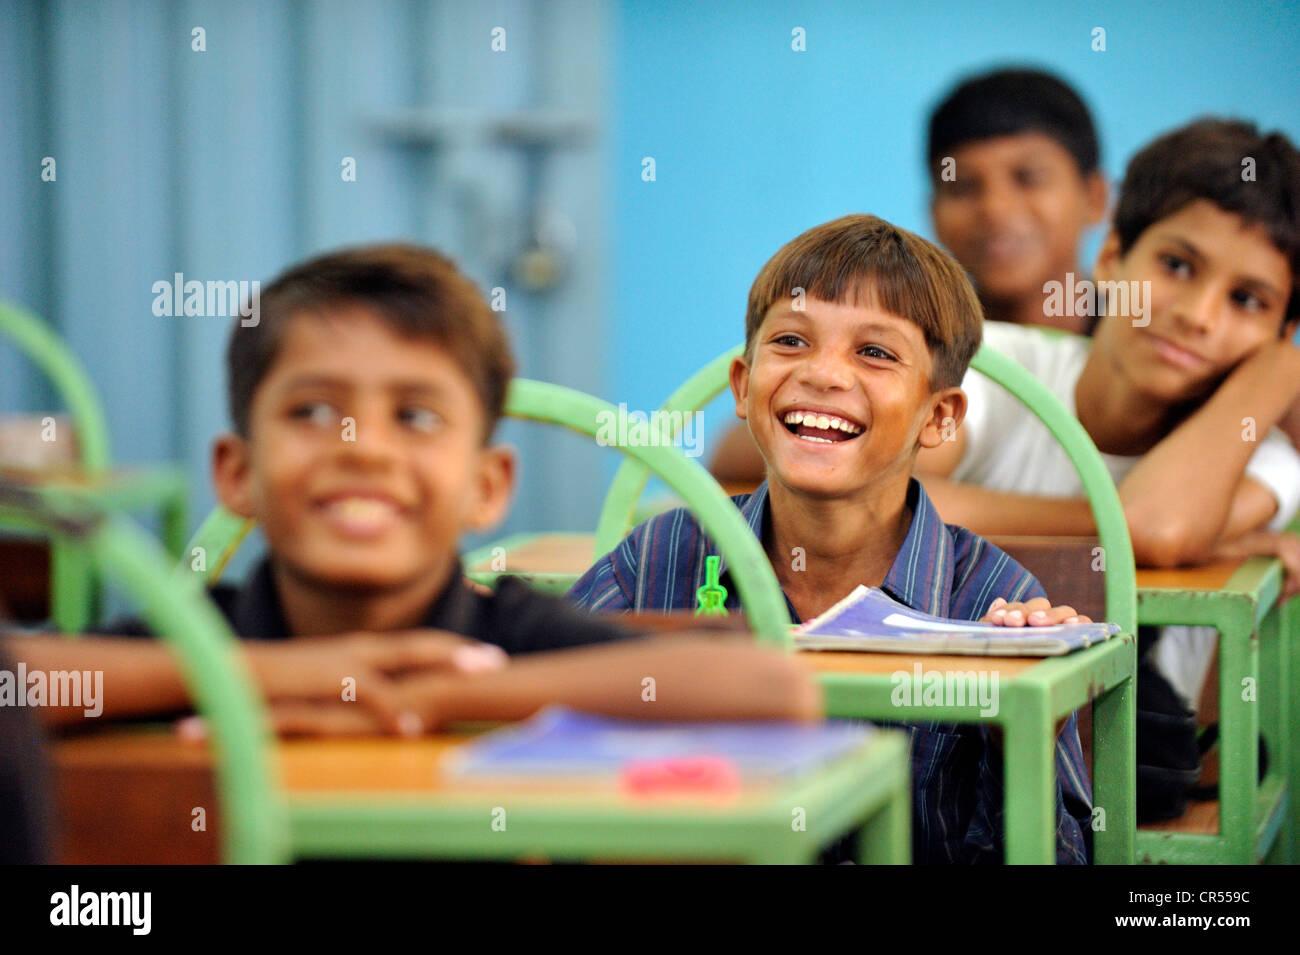 Pakistani boys seating at their school desks, Lahore, Punjab, Pakistan, Asia - Stock Image